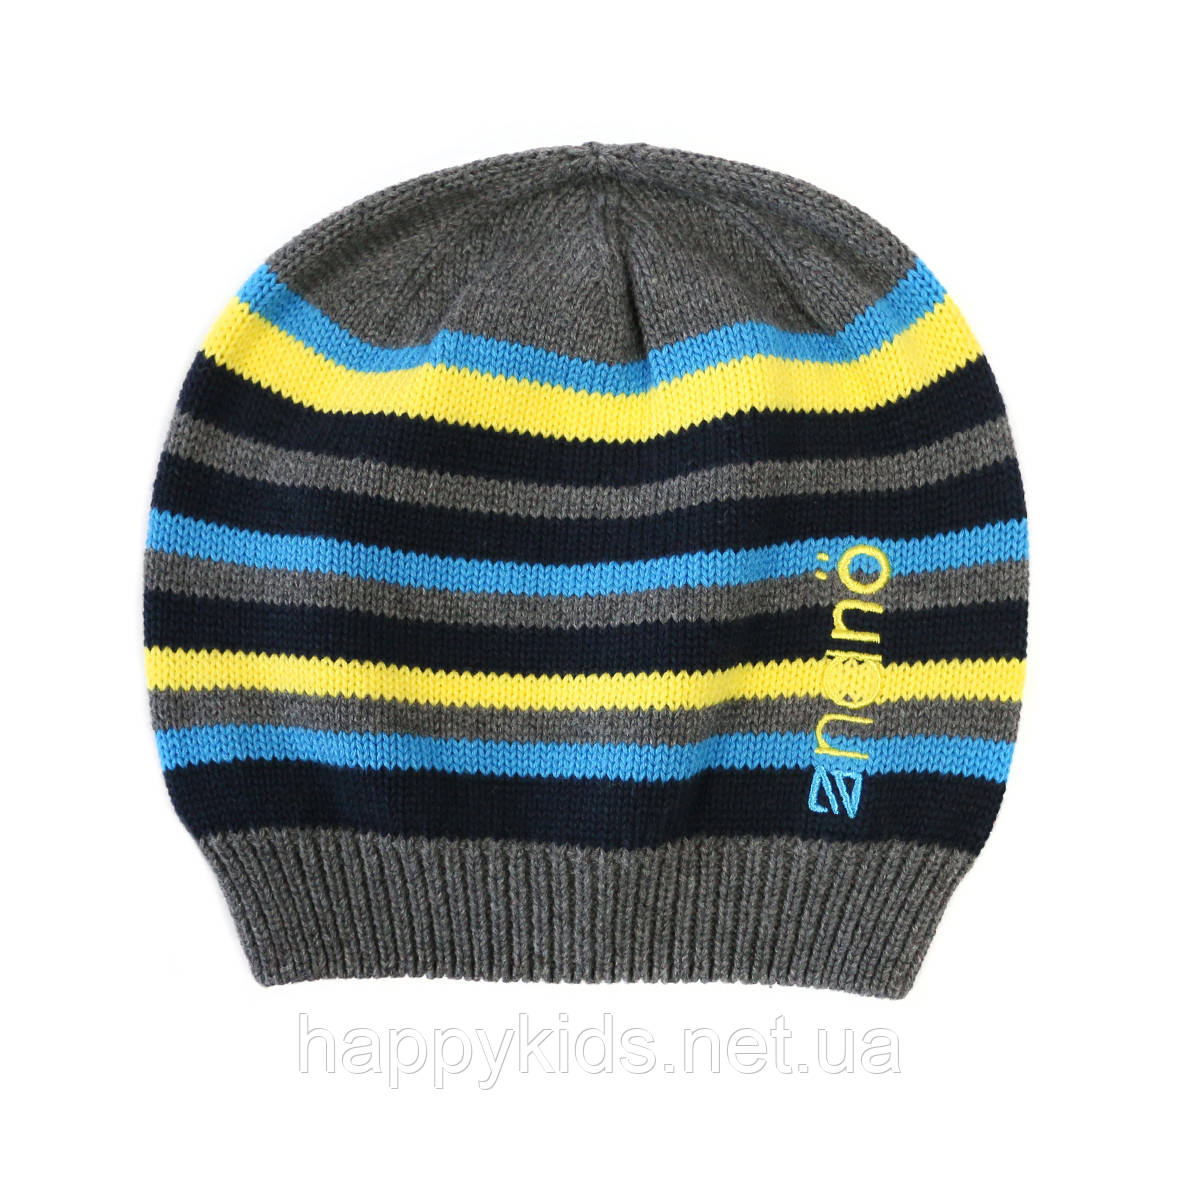 Демисезонная шапка  для мальчика  NANO 255 TUT S17.  Р-р  12/24 мес - 7/12.